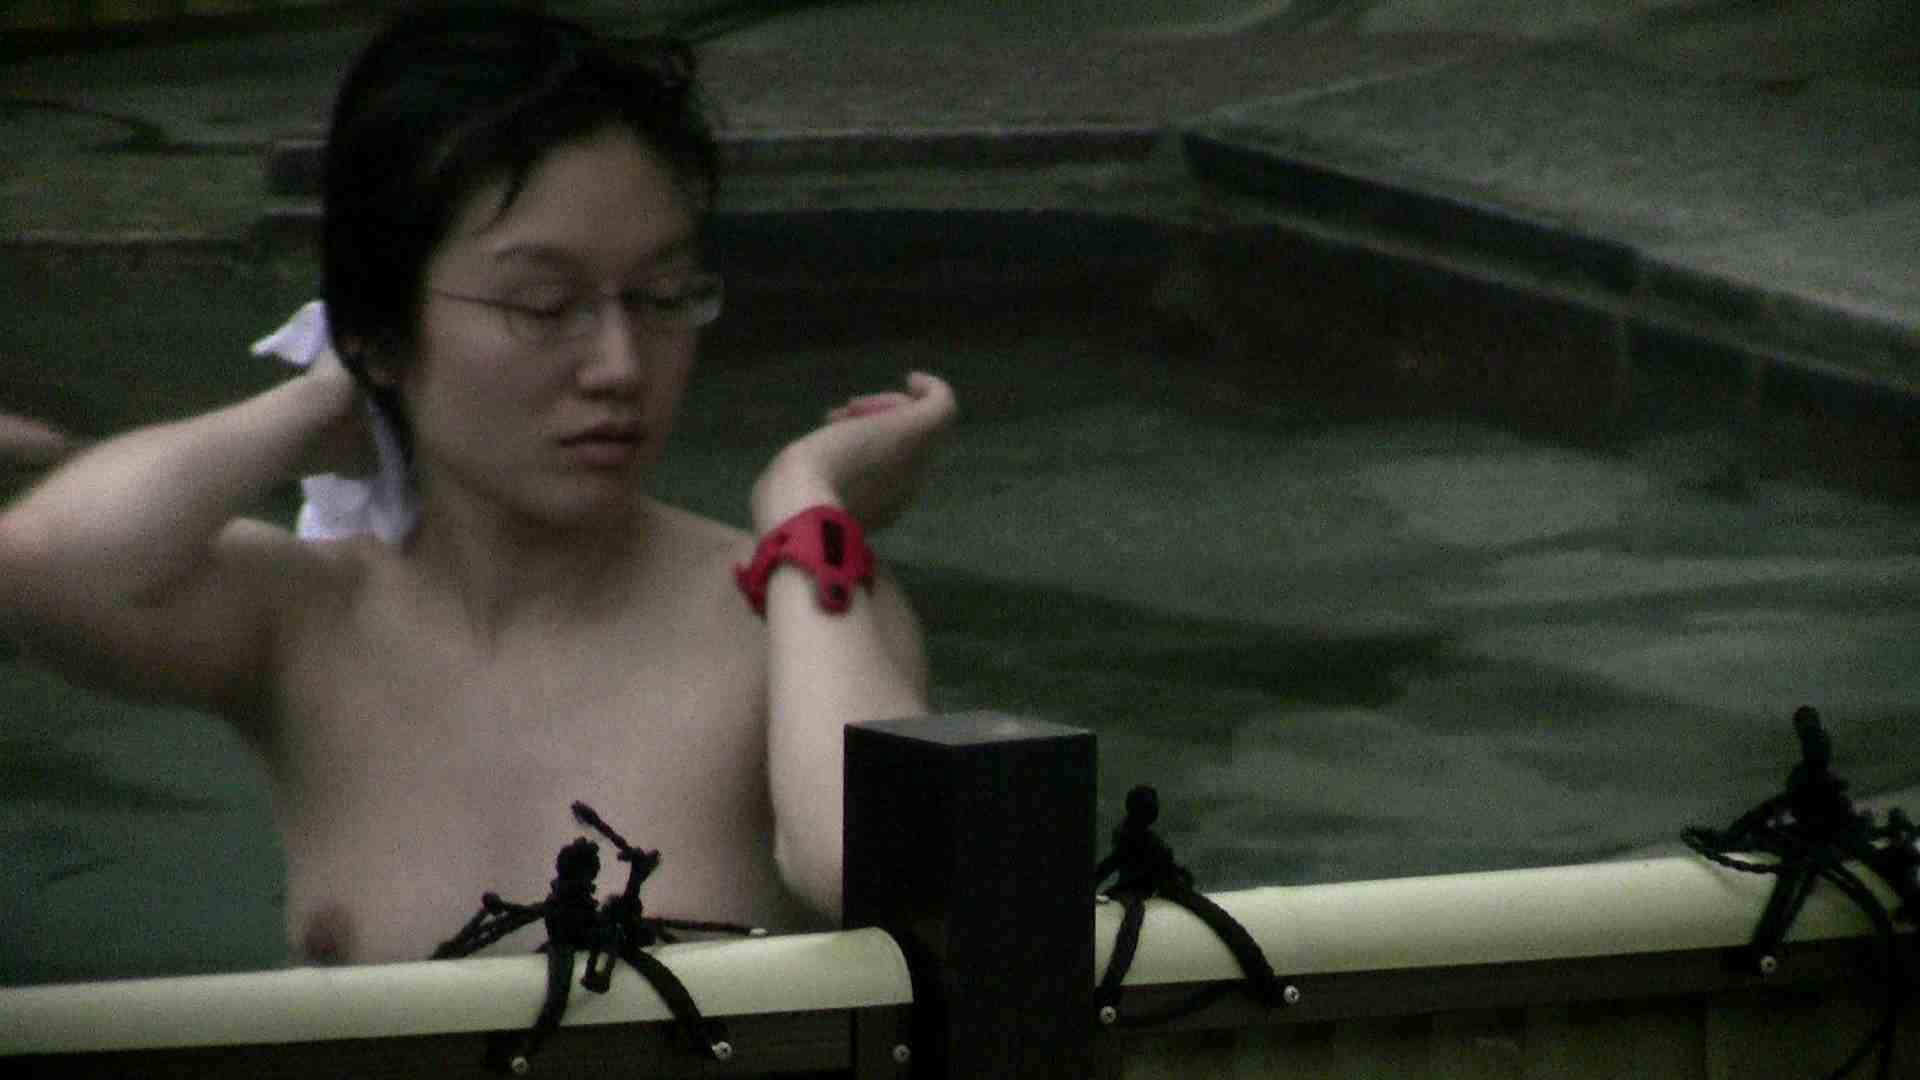 Aquaな露天風呂Vol.684 盗撮 アダルト動画キャプチャ 59連発 32